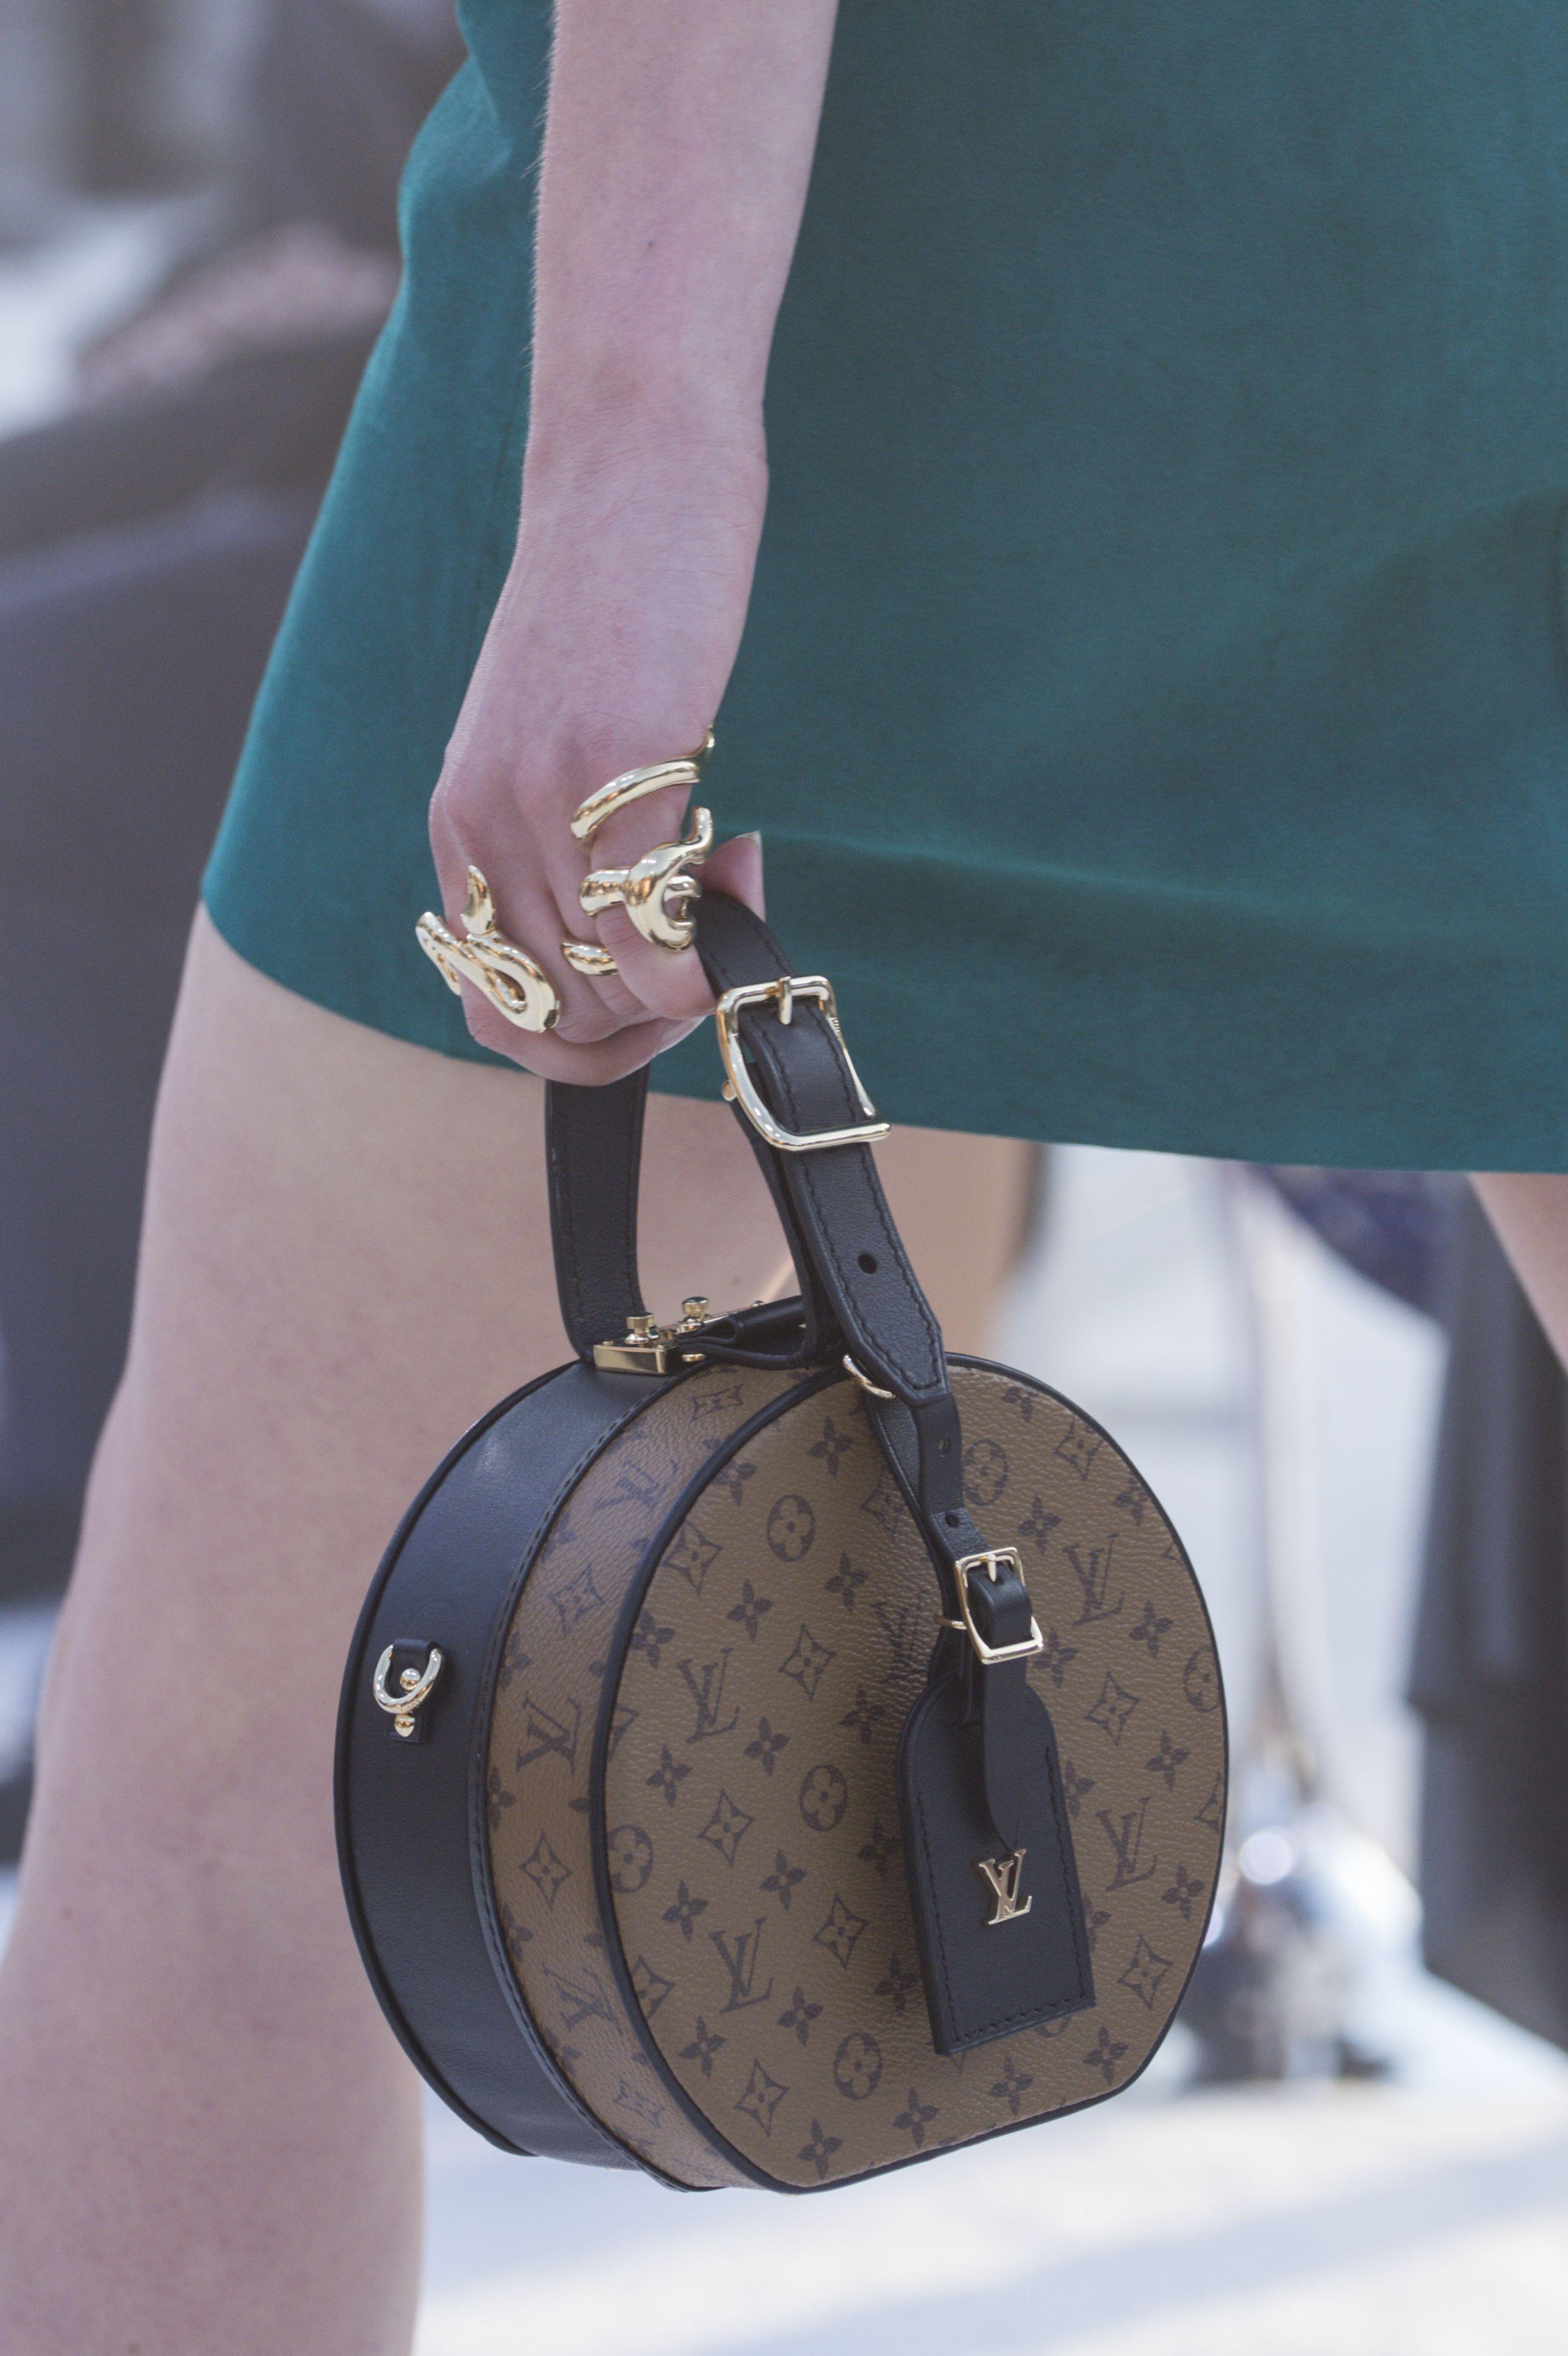 3915fda5ef91 A bag from the Louis Vuitton Cruise 2018 Fashion Show by Nicolas  Ghesquière